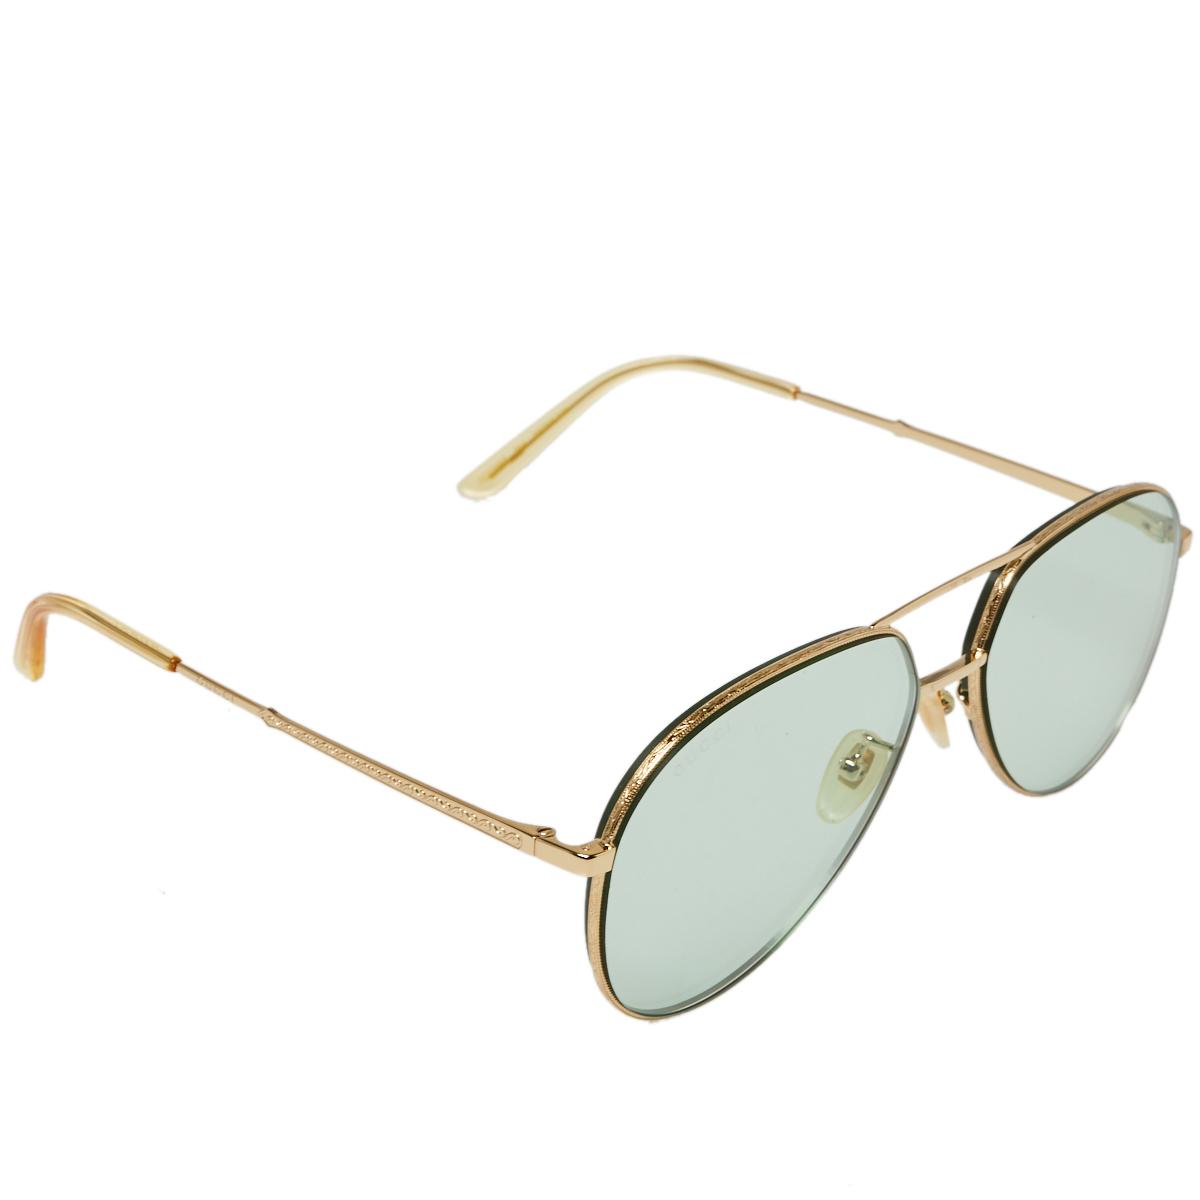 Pre-owned Gucci Gold Tone/green Gg0356s Aviator Sunglasses